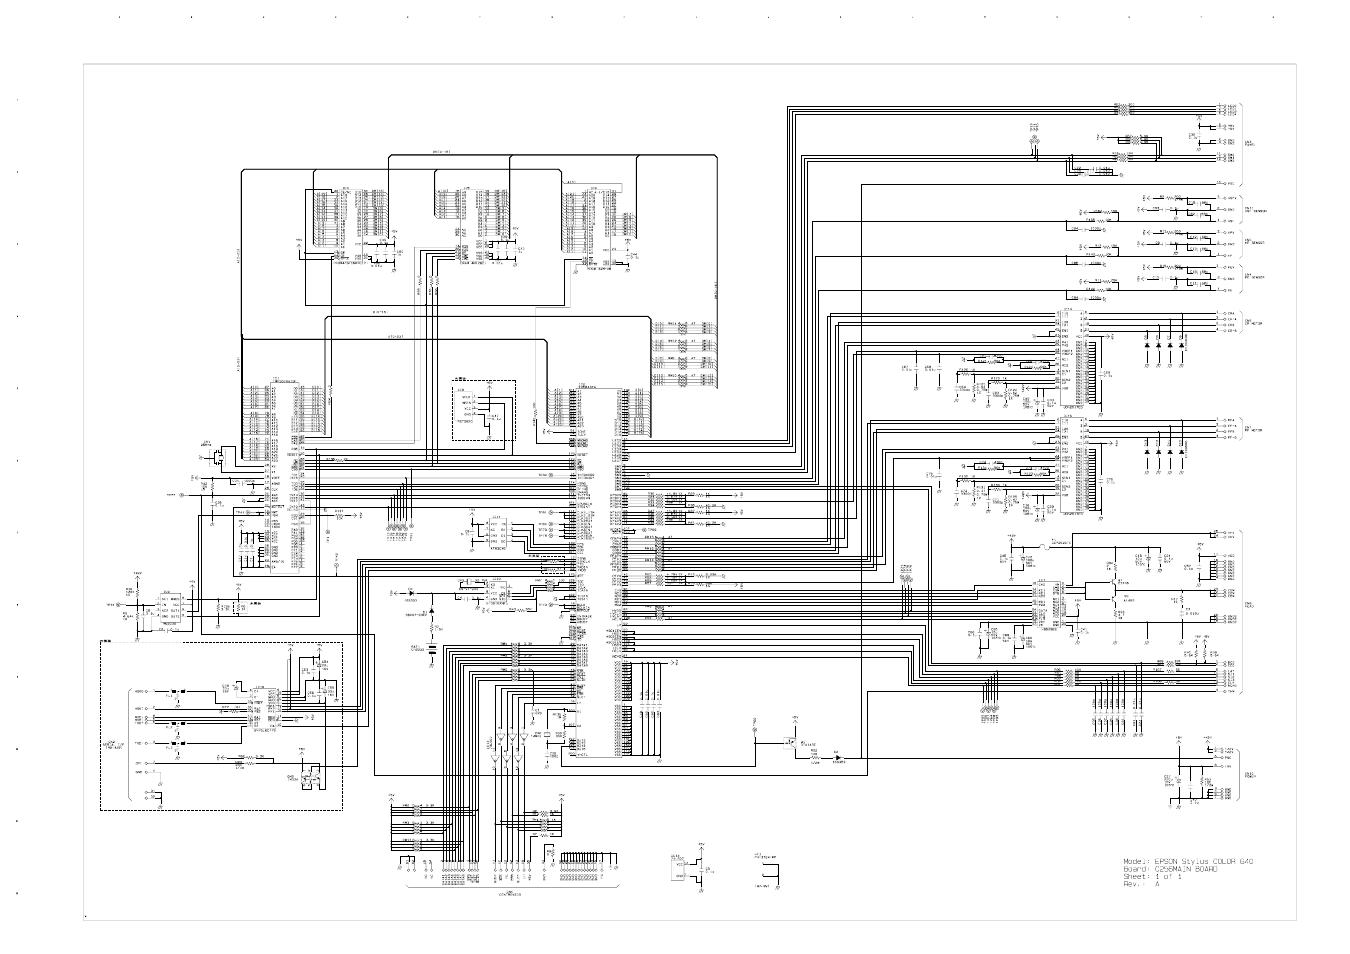 C256main Circuit Diagram